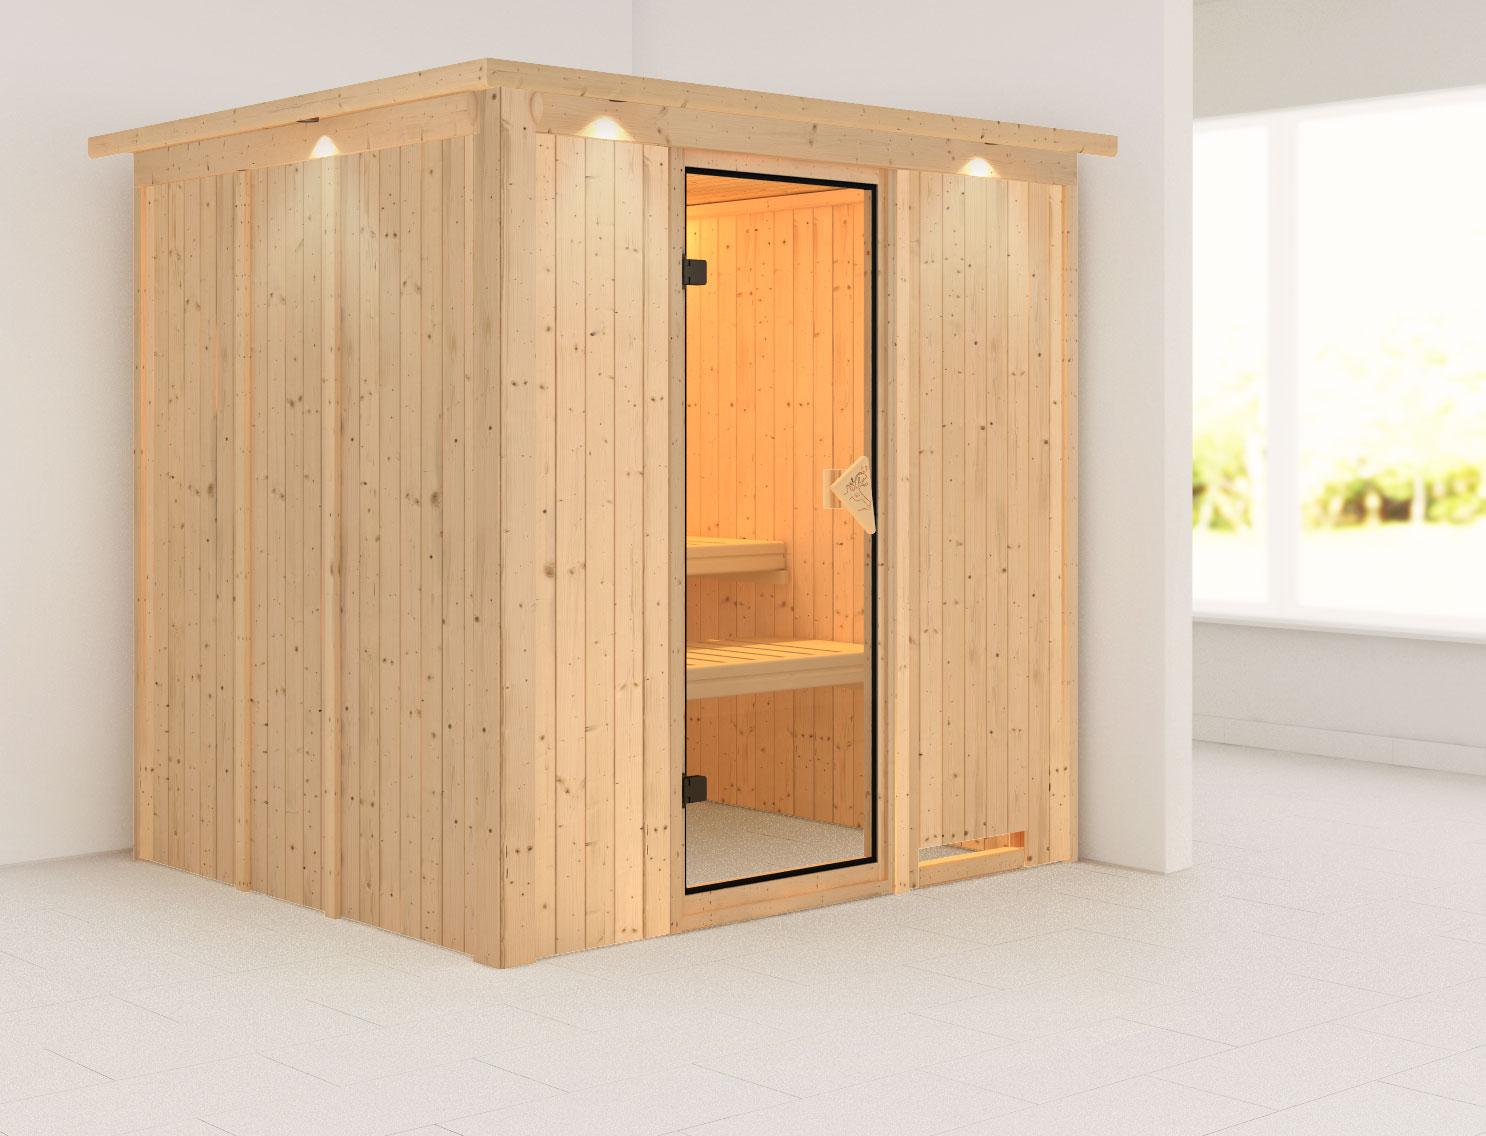 Karibu Sauna Sodin 68mm Dachkranz ohne Ofen classic Tür Bild 1